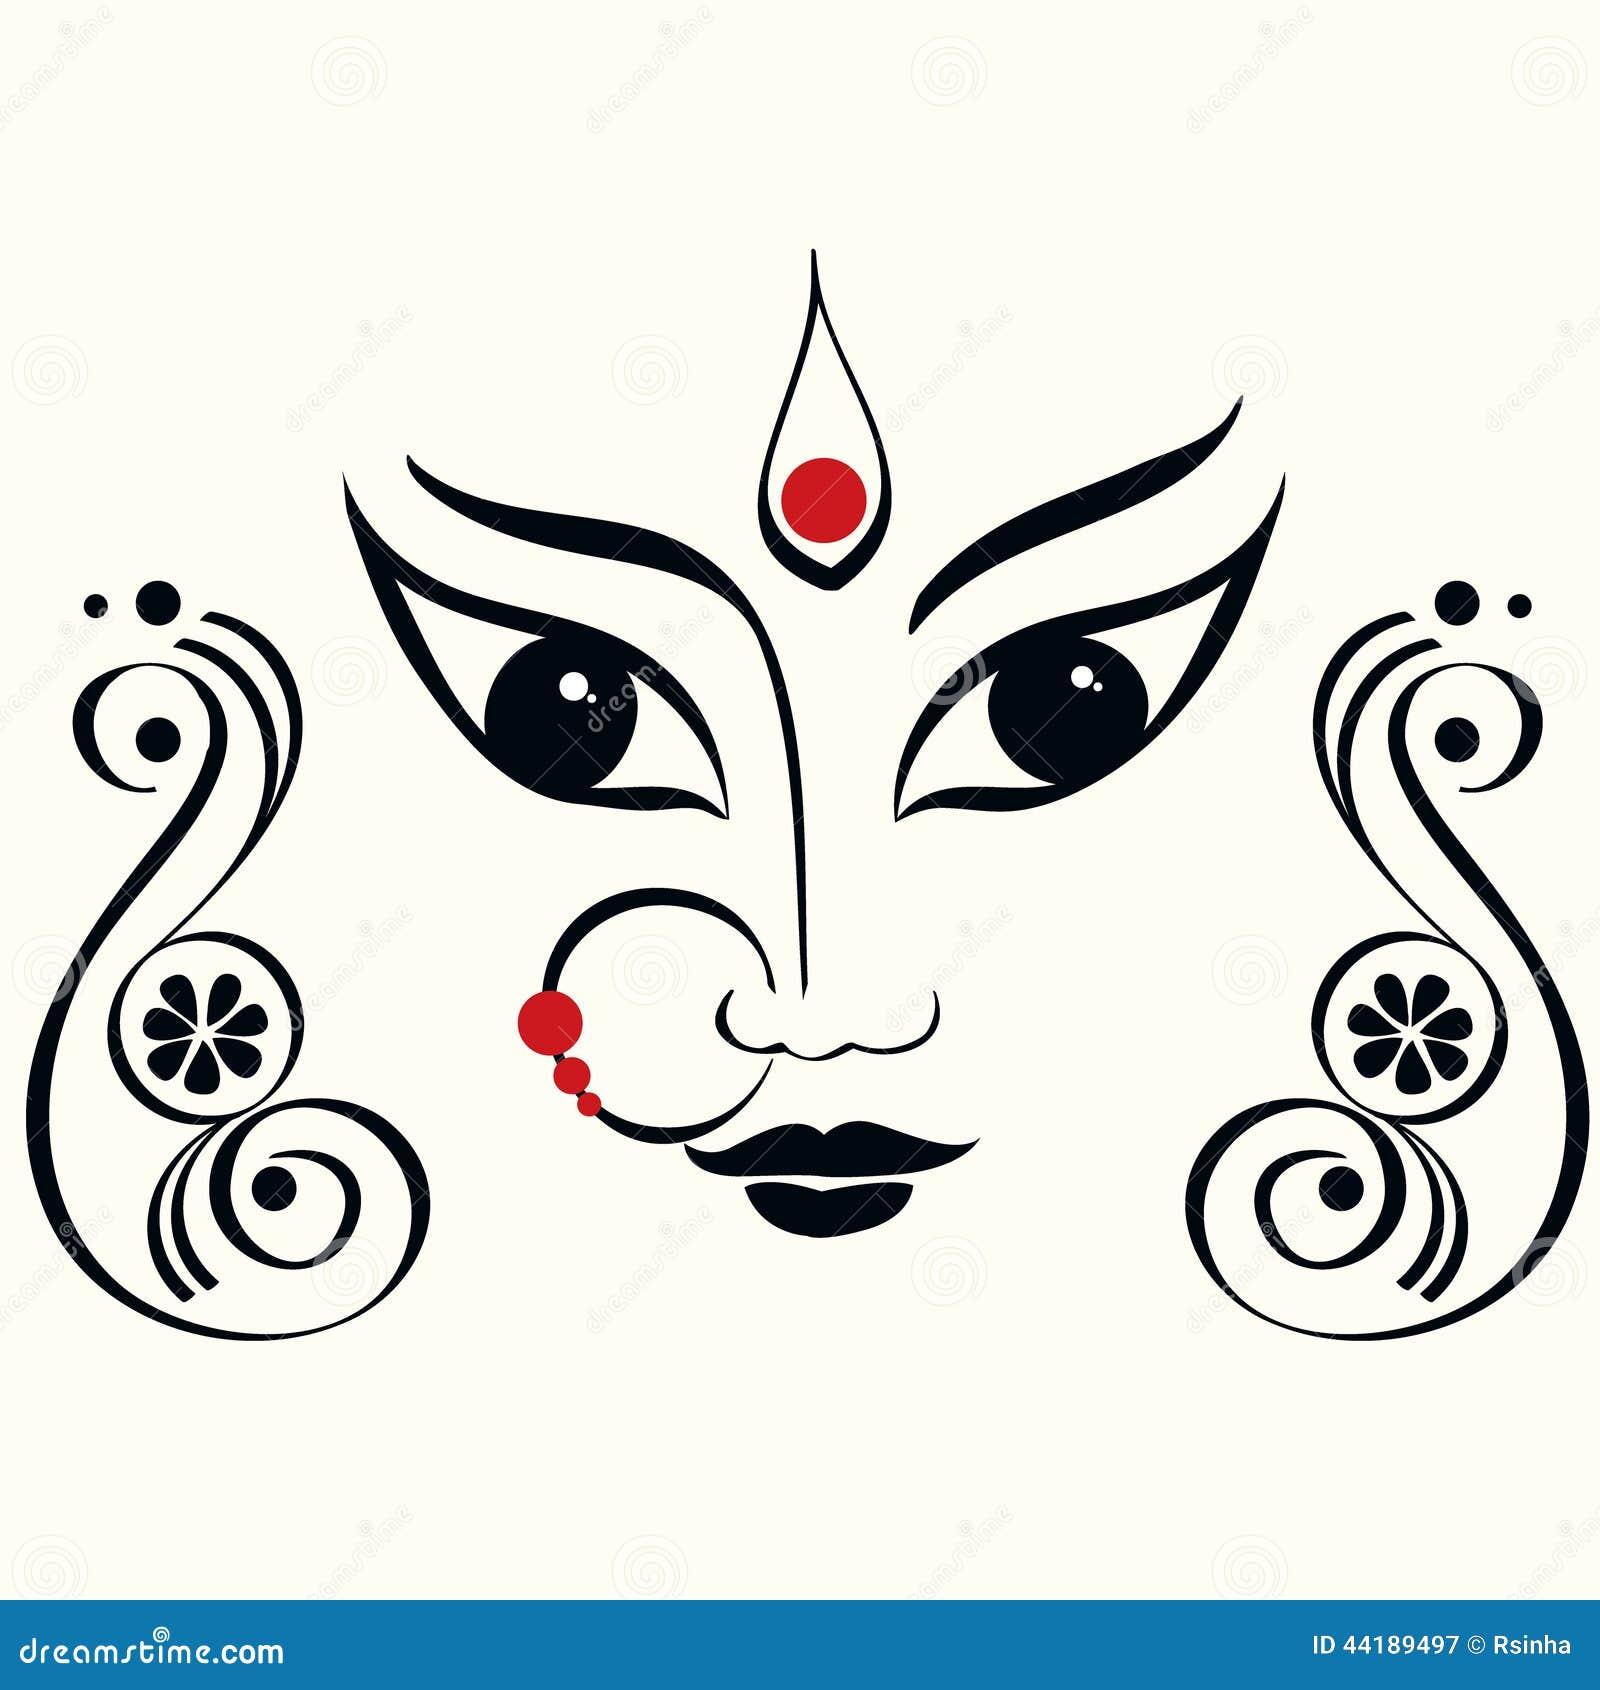 Durga Illustration Stock Vector. Illustration Of